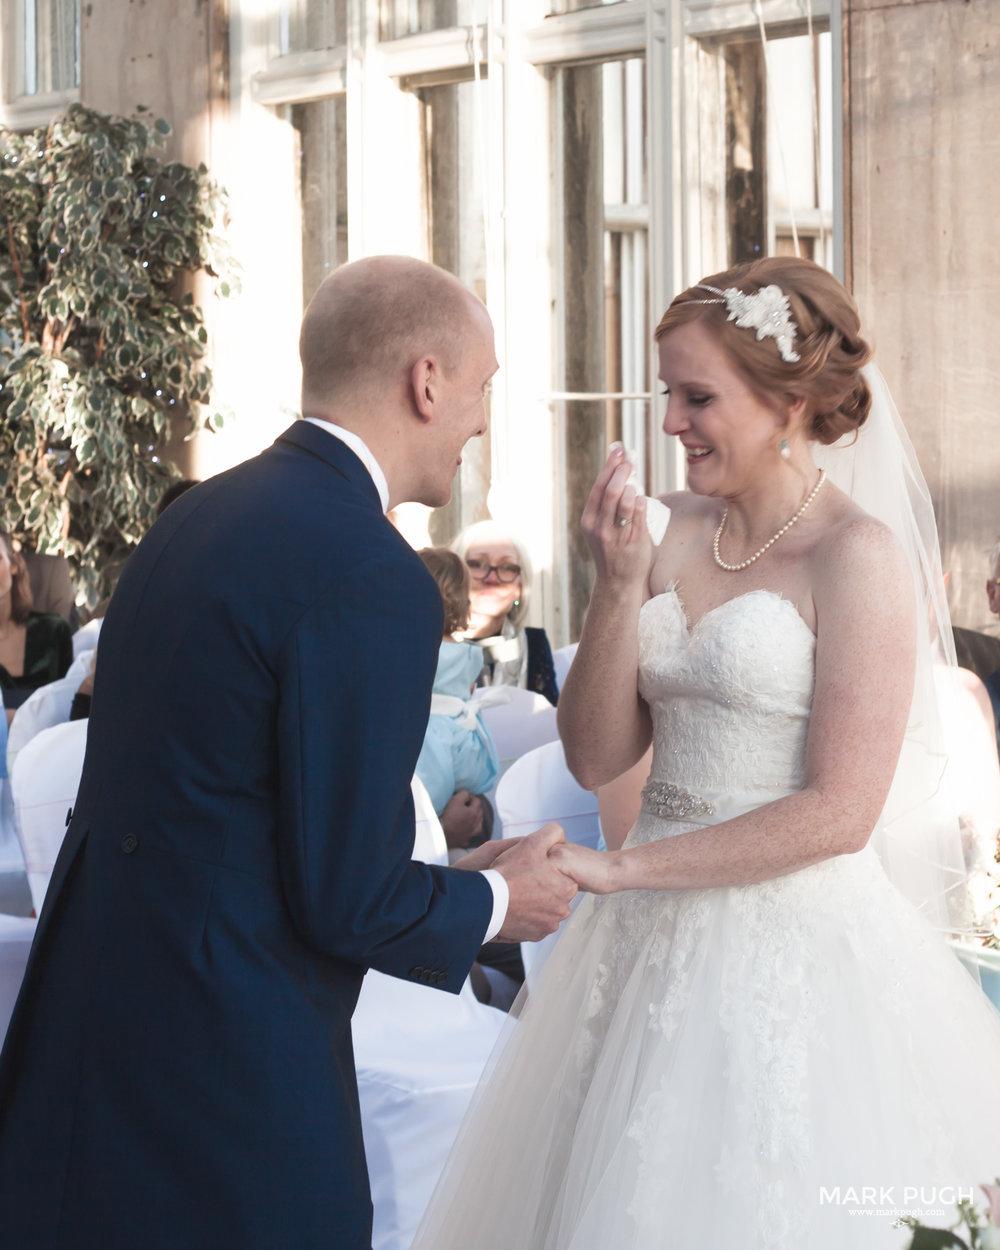 053 - Fay and Craig - fineART Wedding Photography at Stoke Rochford Hall NG33 5EJ by www.markpugh.com Mark Pugh of www.mpmedia.co.uk_.JPG